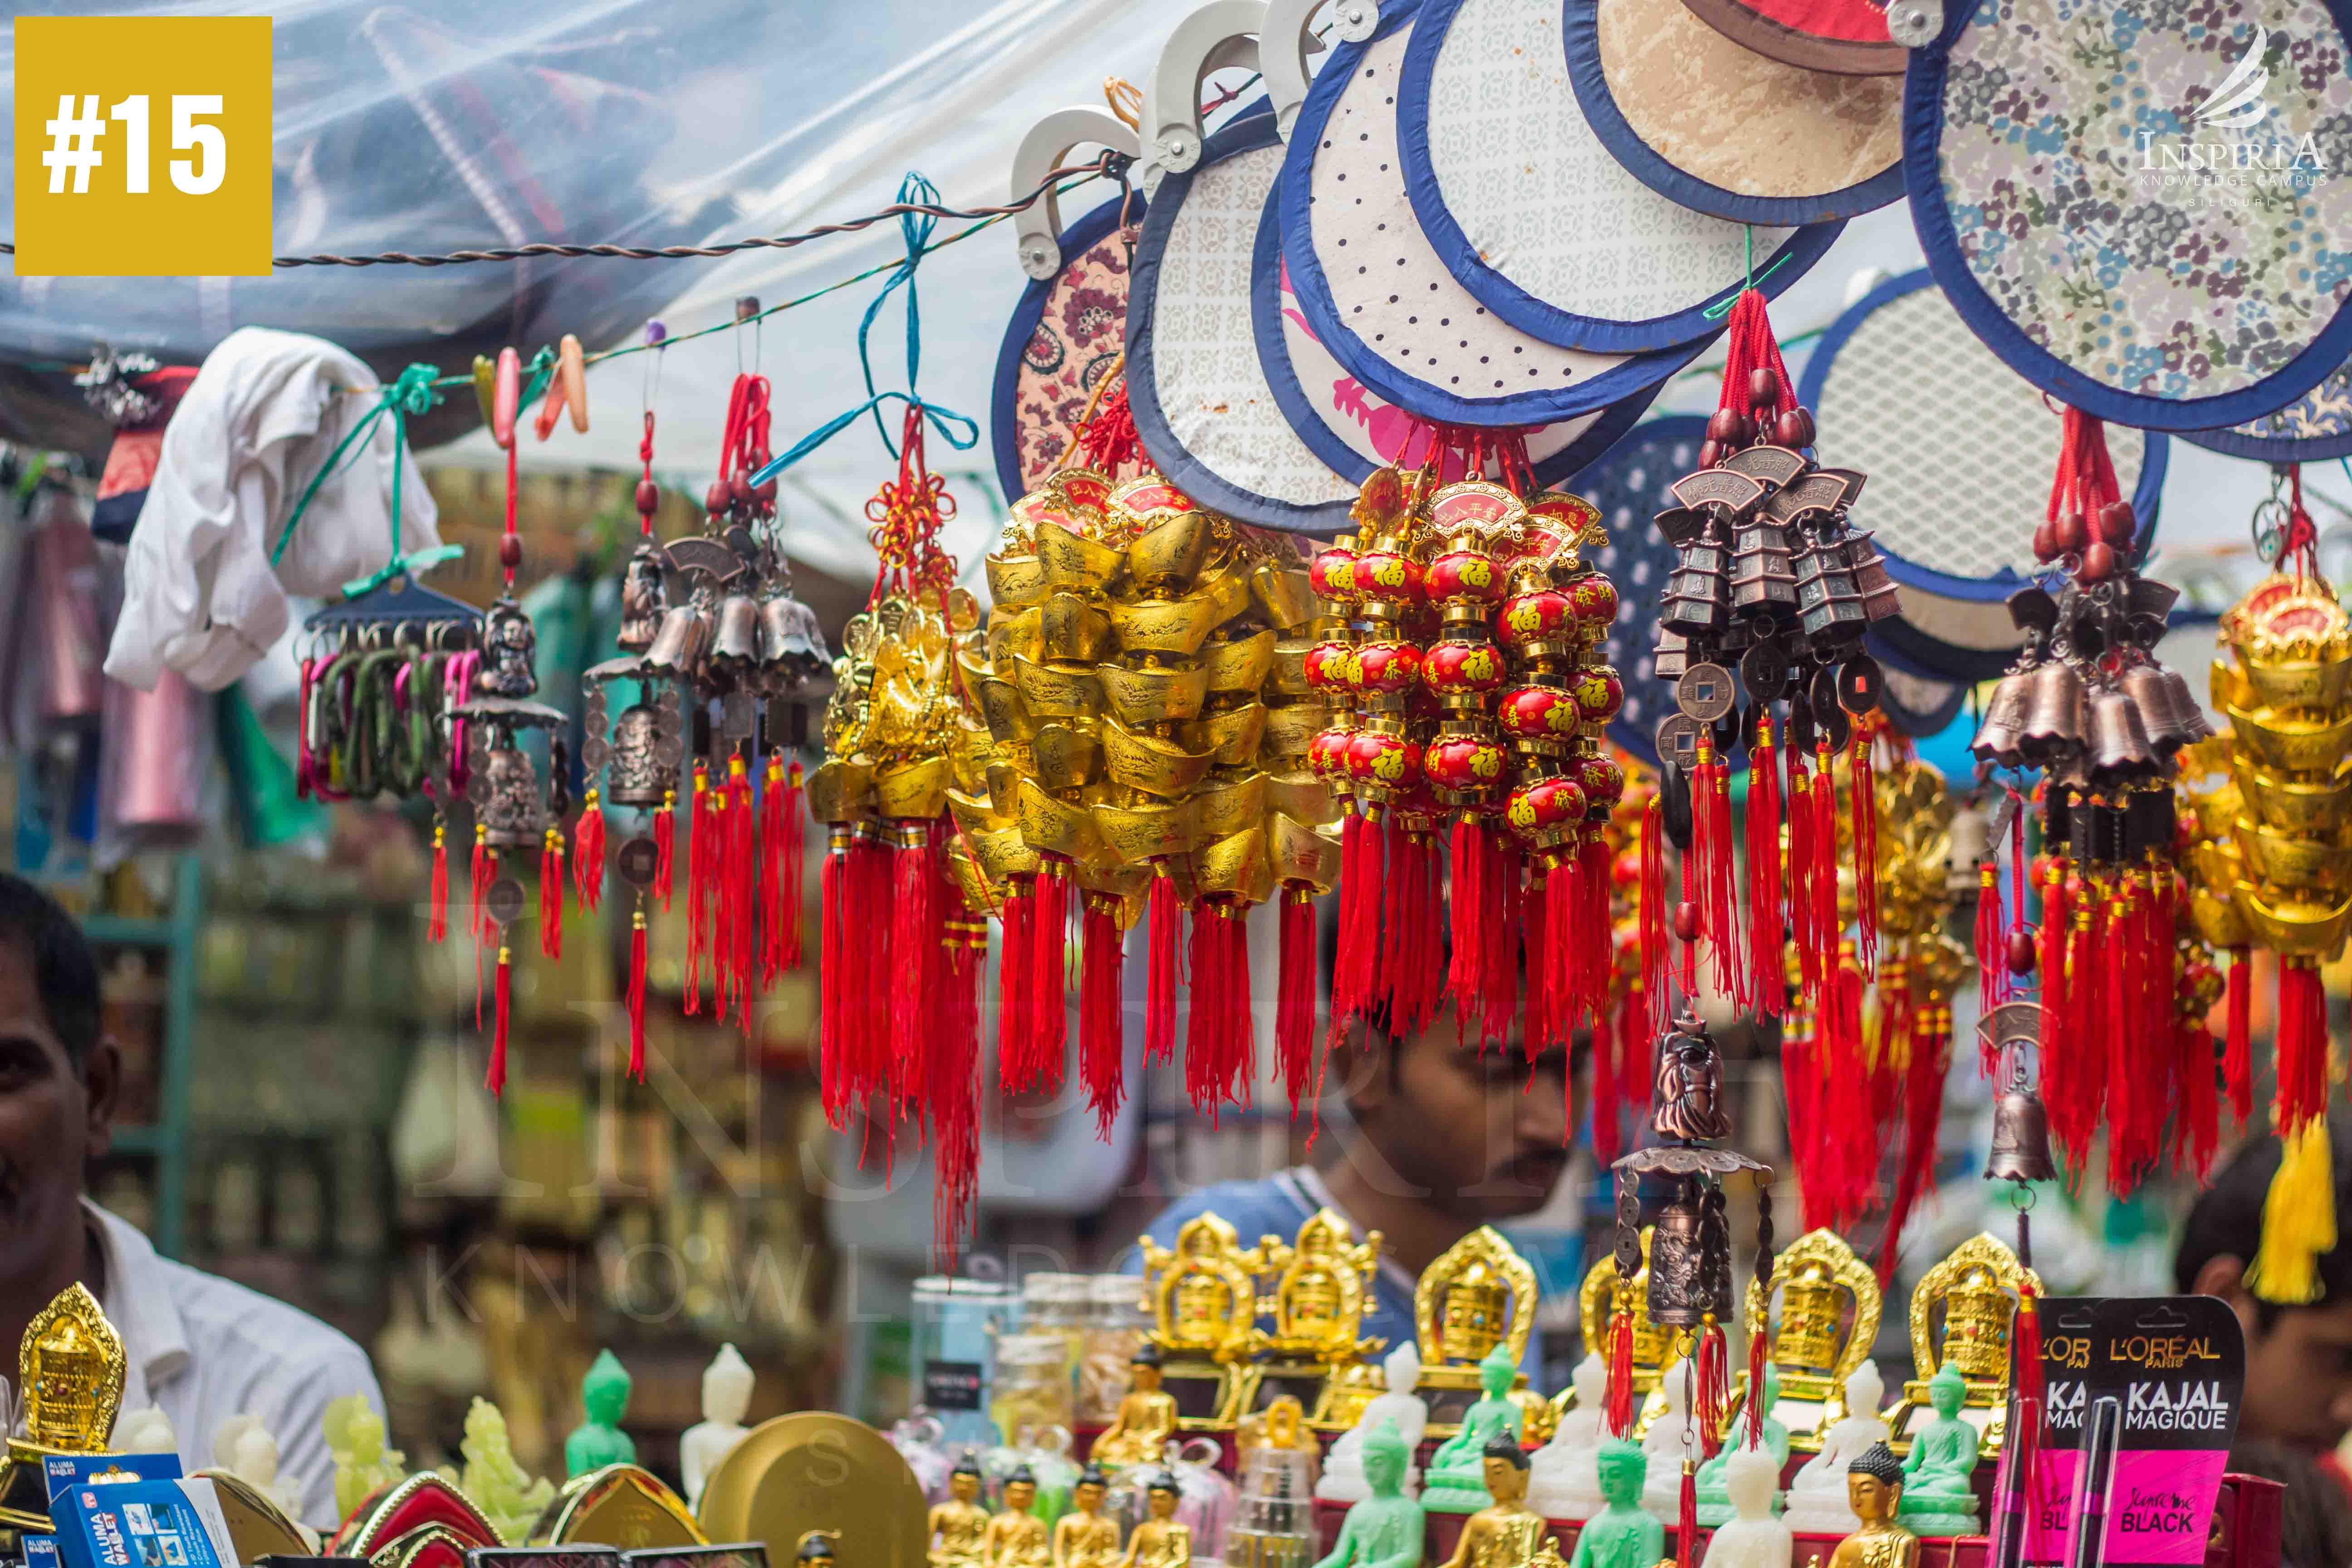 Hong-kong-market-buddha-siliguri-westbengal-lucky-charms